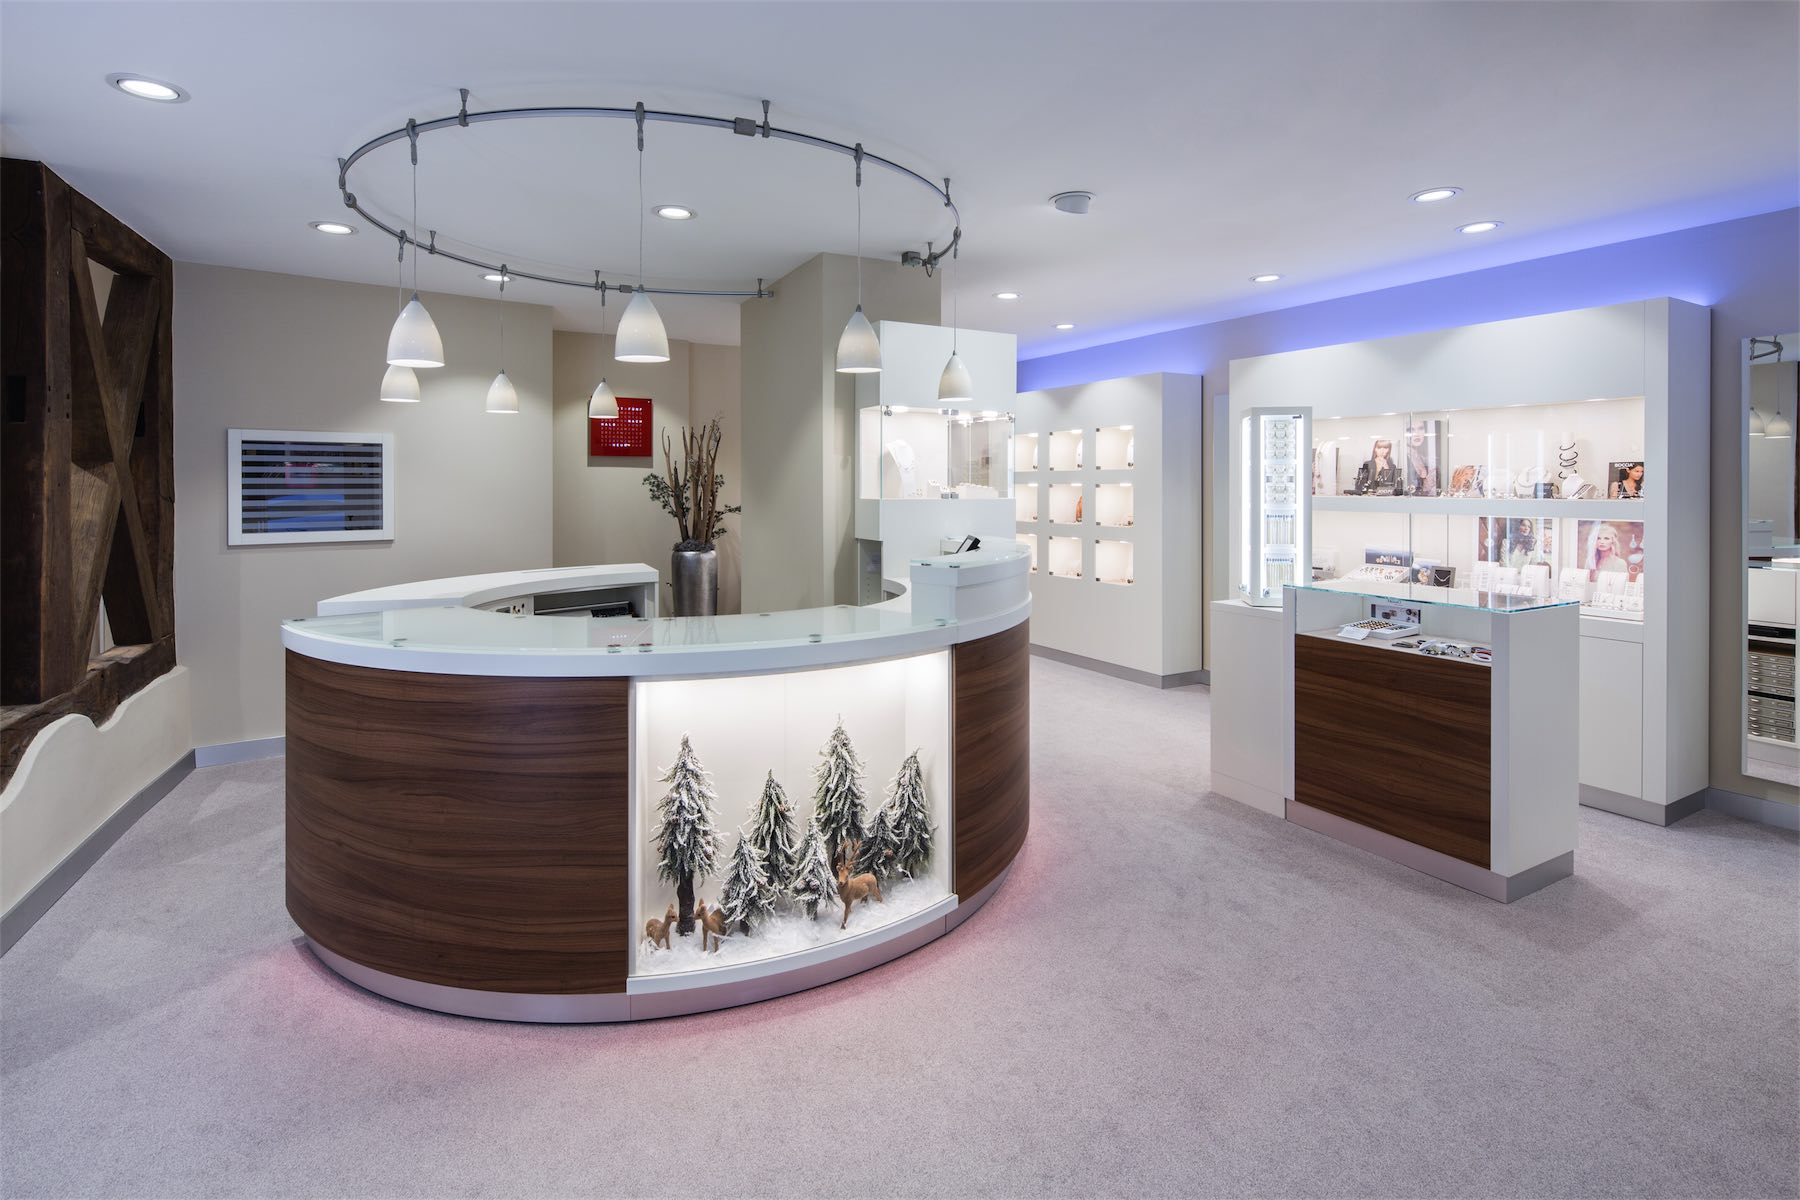 Juwelier  Ladenbau Juwelier | Ladenbau und Ladeneinrichtung